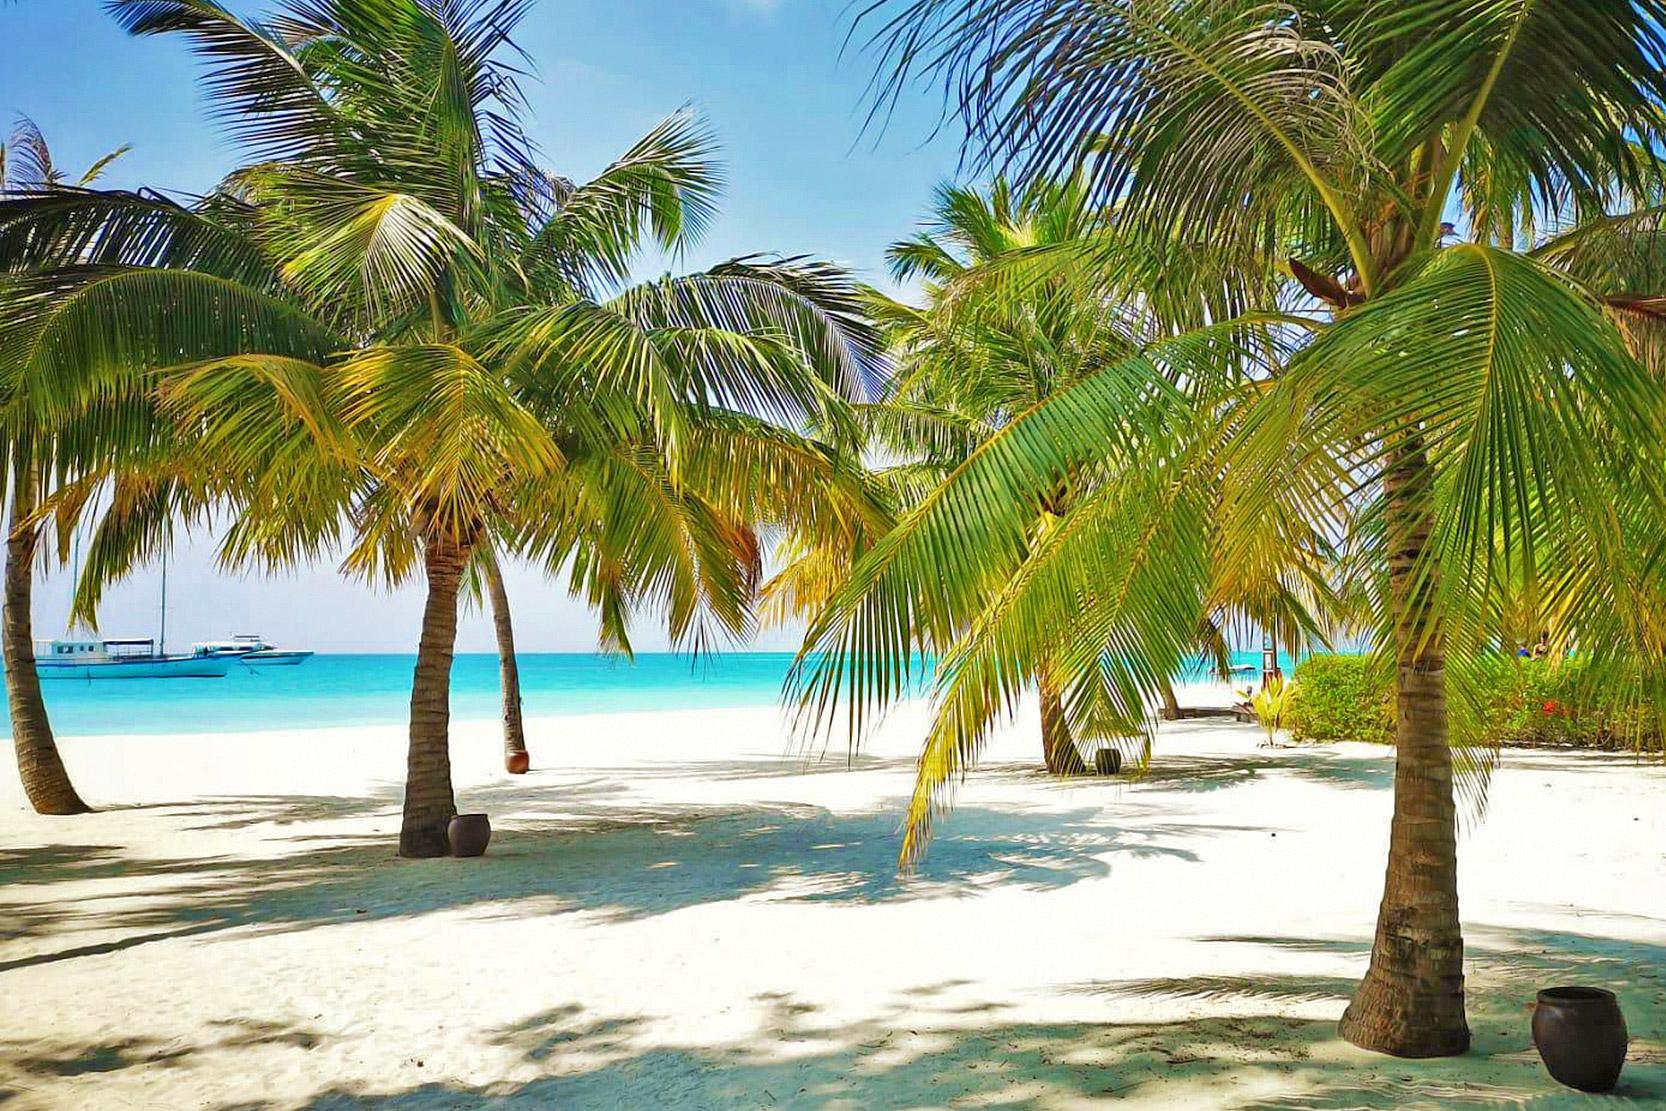 Sejur charter Maldive, 10 zile - 23 ianuarie 2022